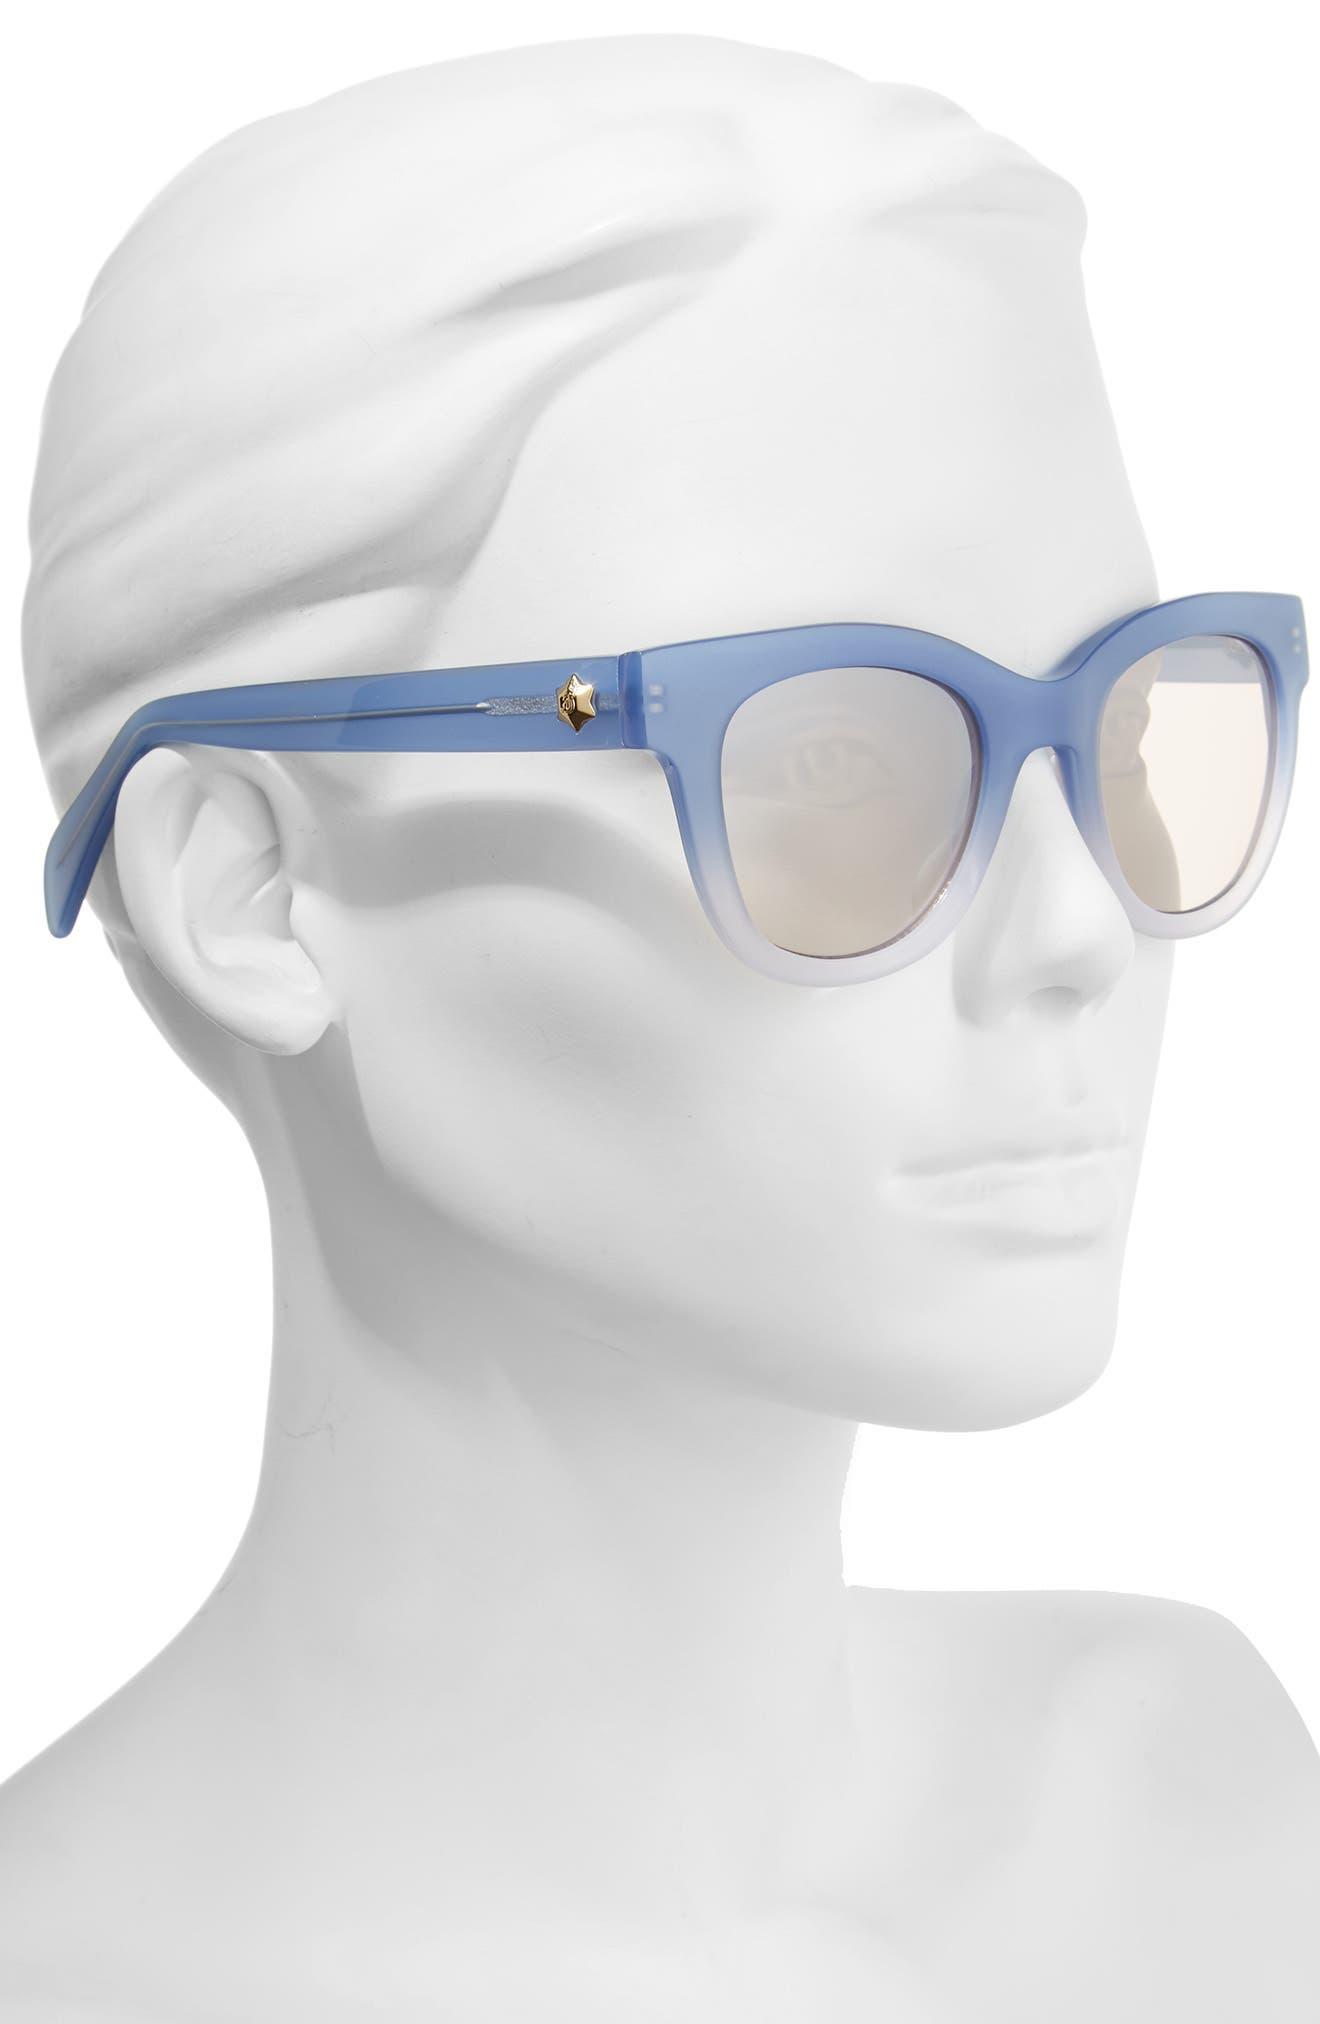 50mm Gradient Lens Cat Eye Sunglasses,                             Alternate thumbnail 3, color,                             Blue